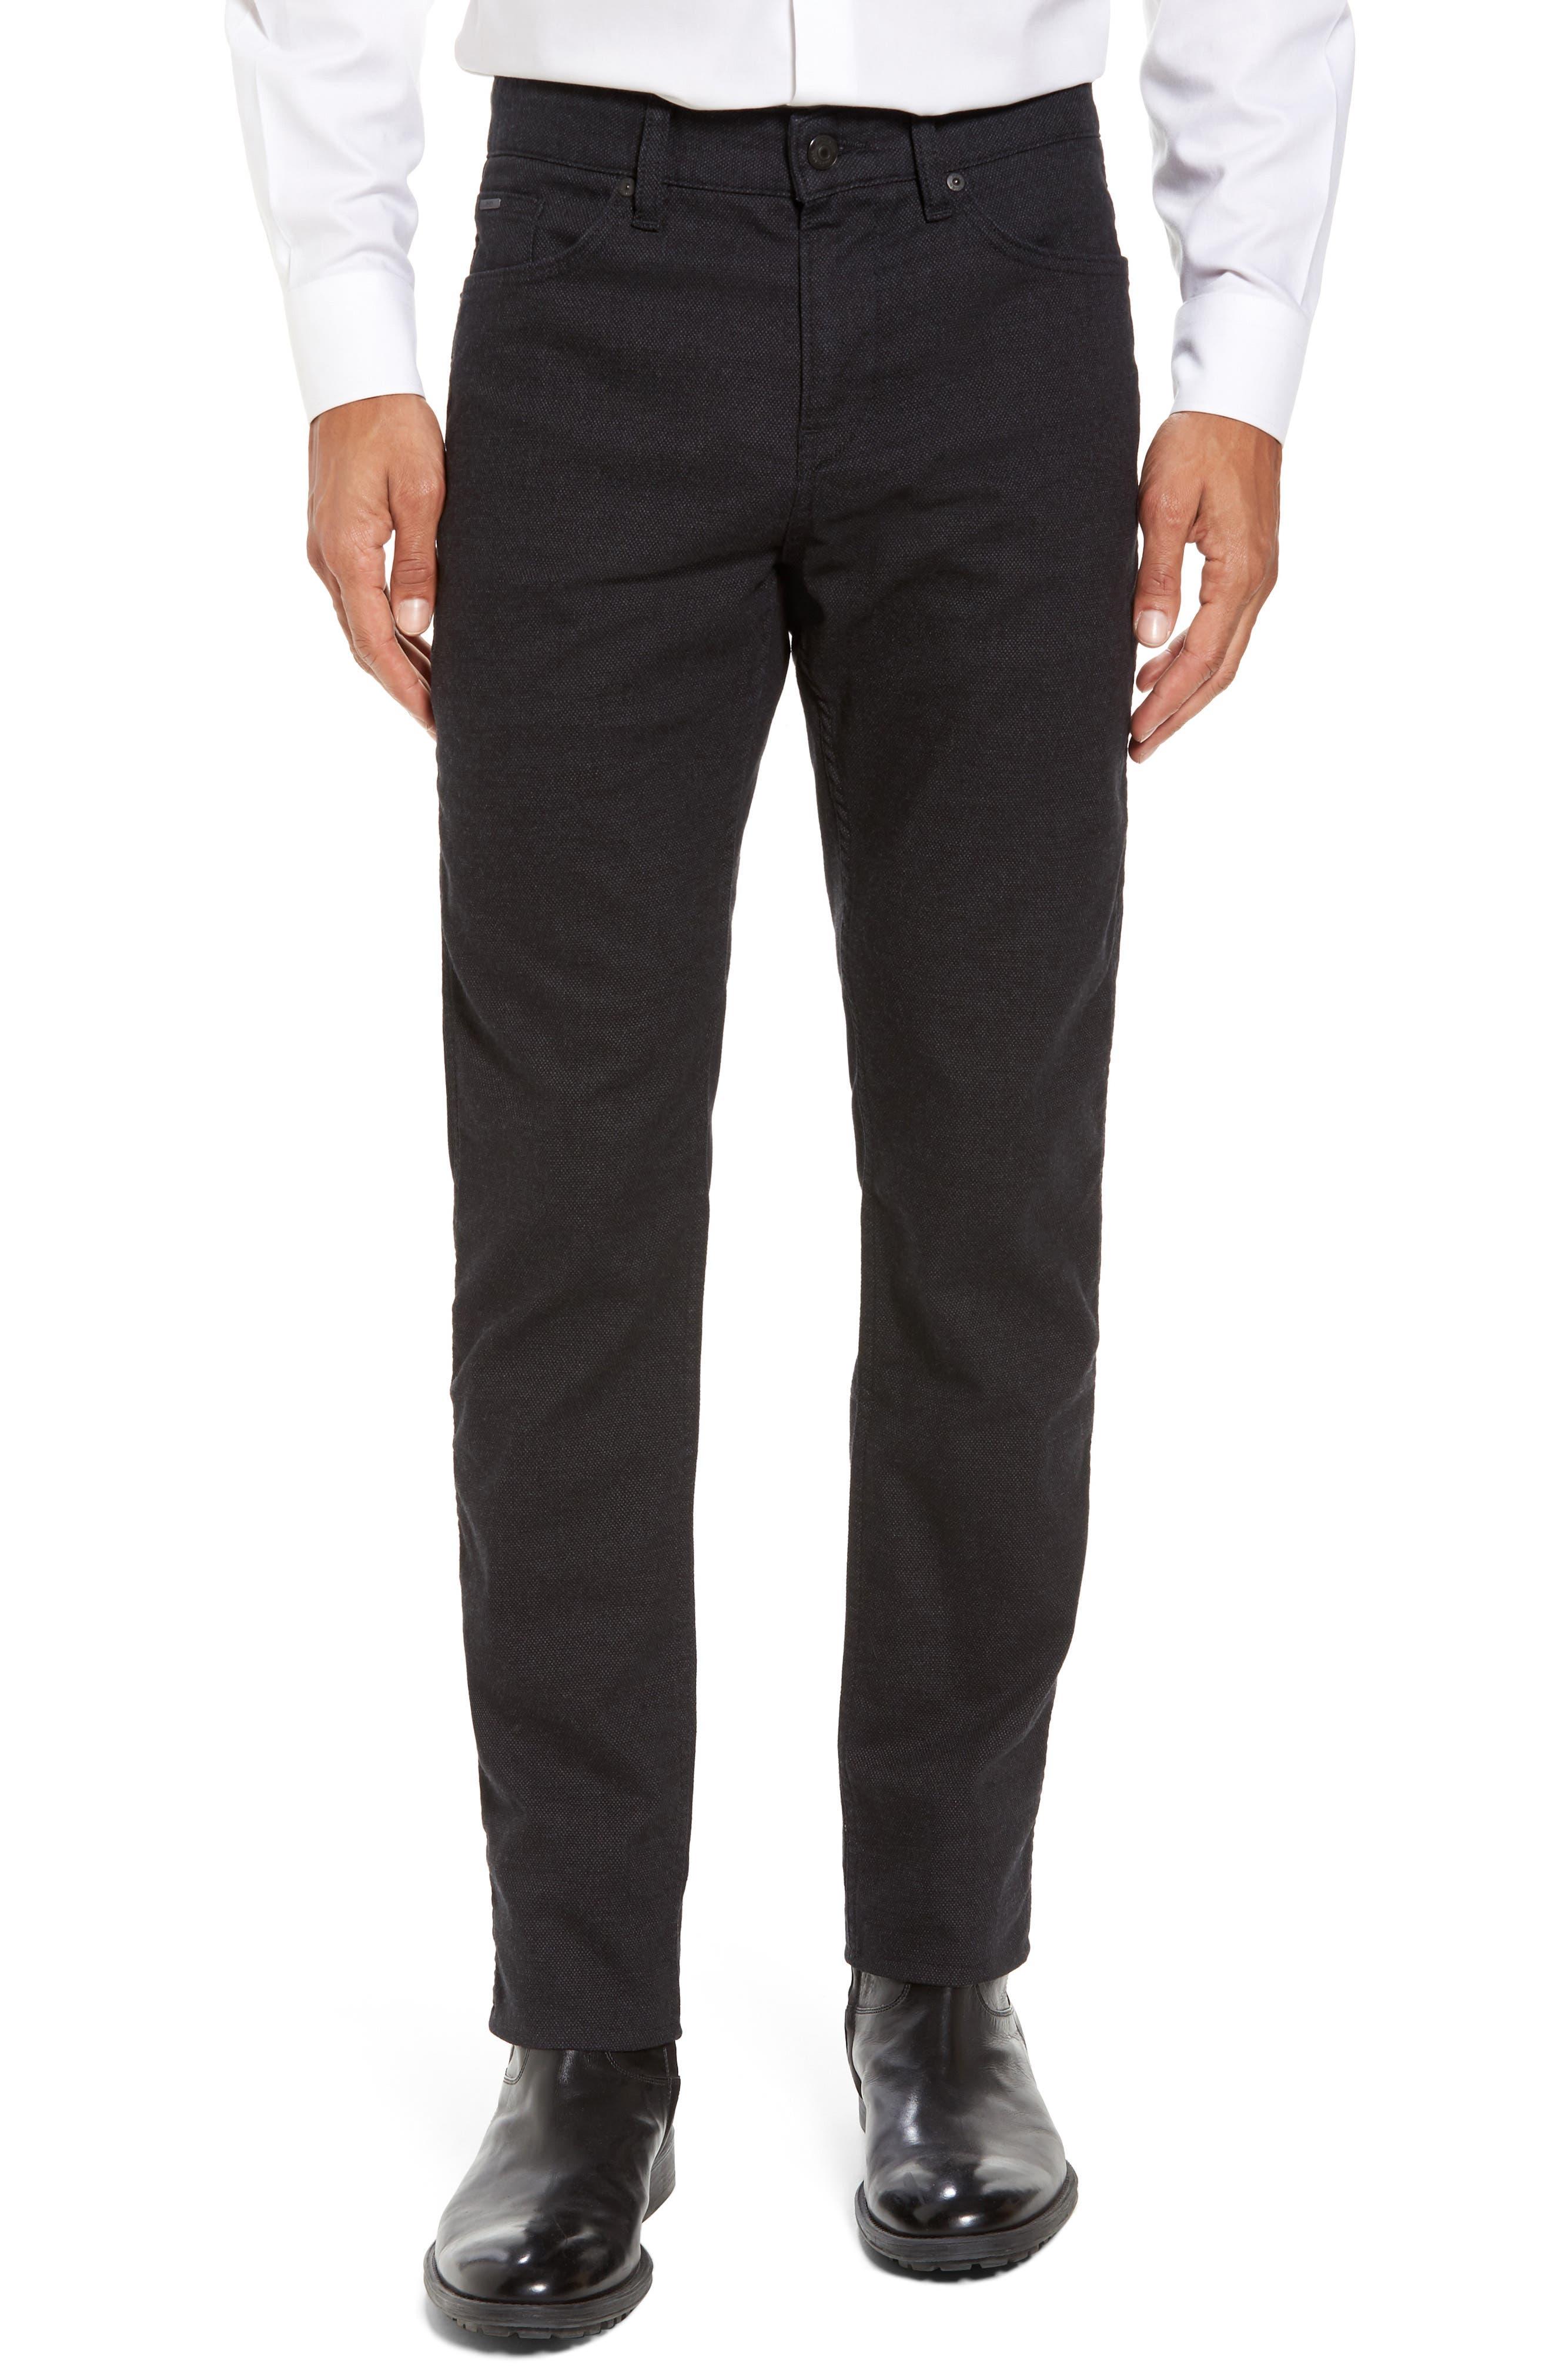 Alternate Image 1 Selected - BOSS Delaware Slim 5-Pocket Pants